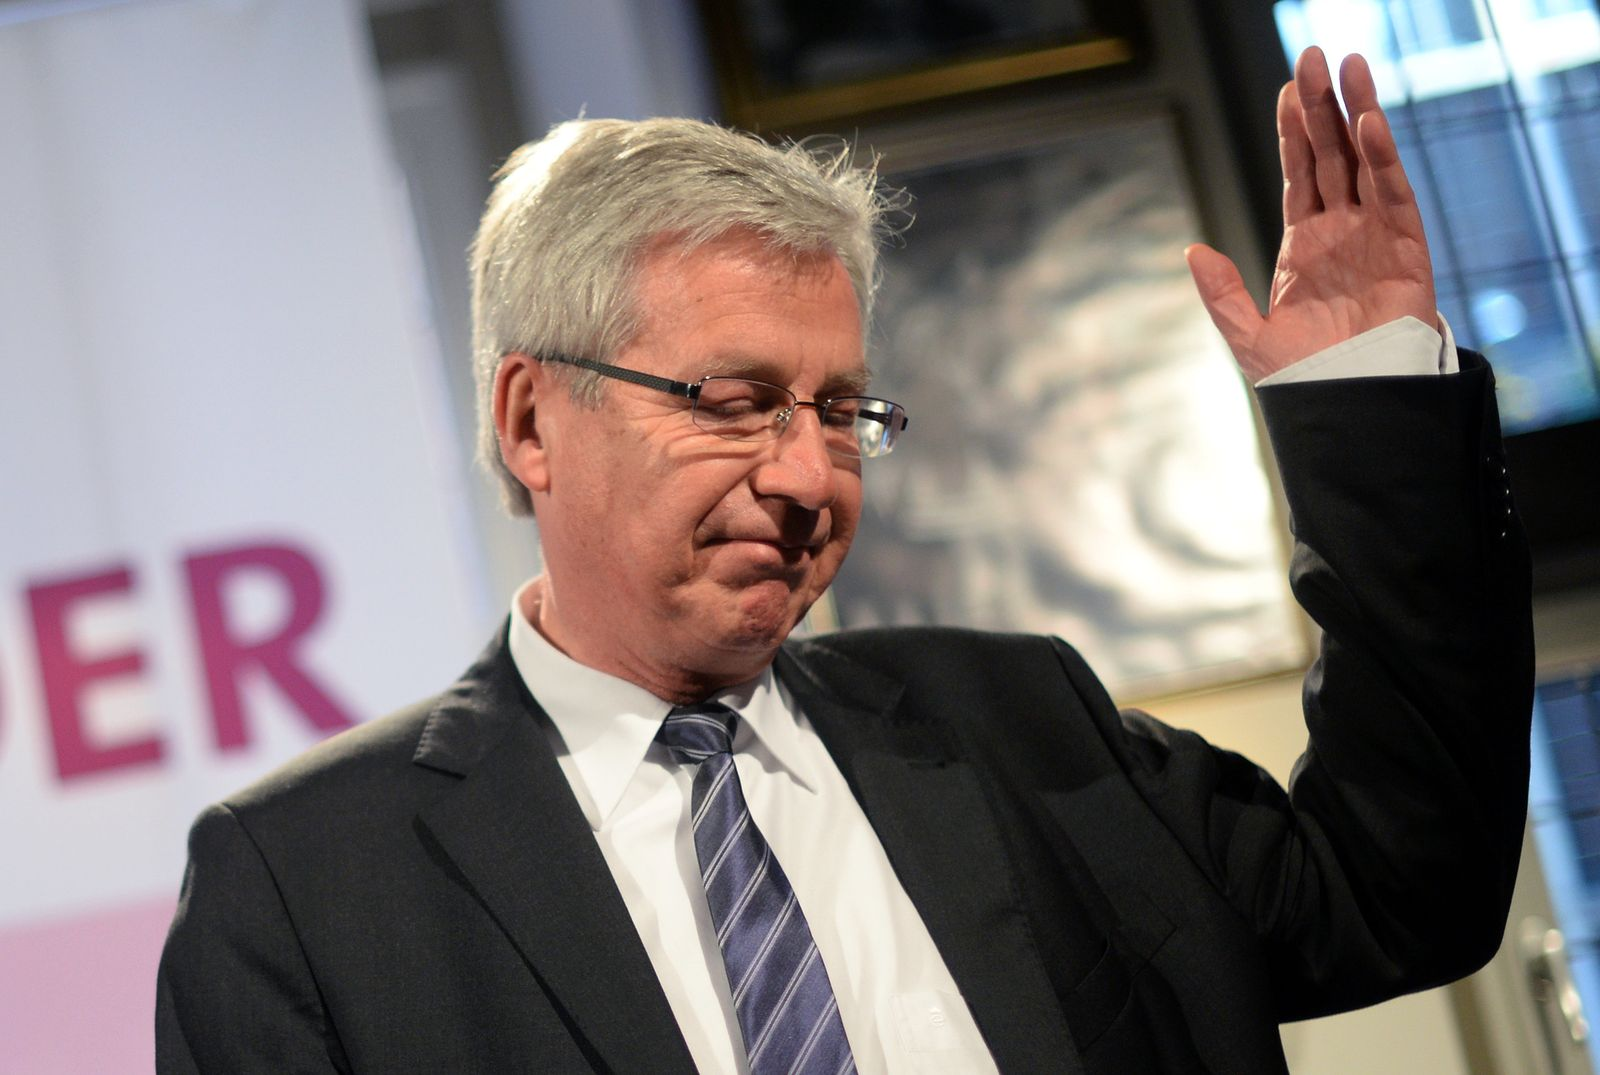 Wahl / Bremen / Jens Böhrnsen / SPD